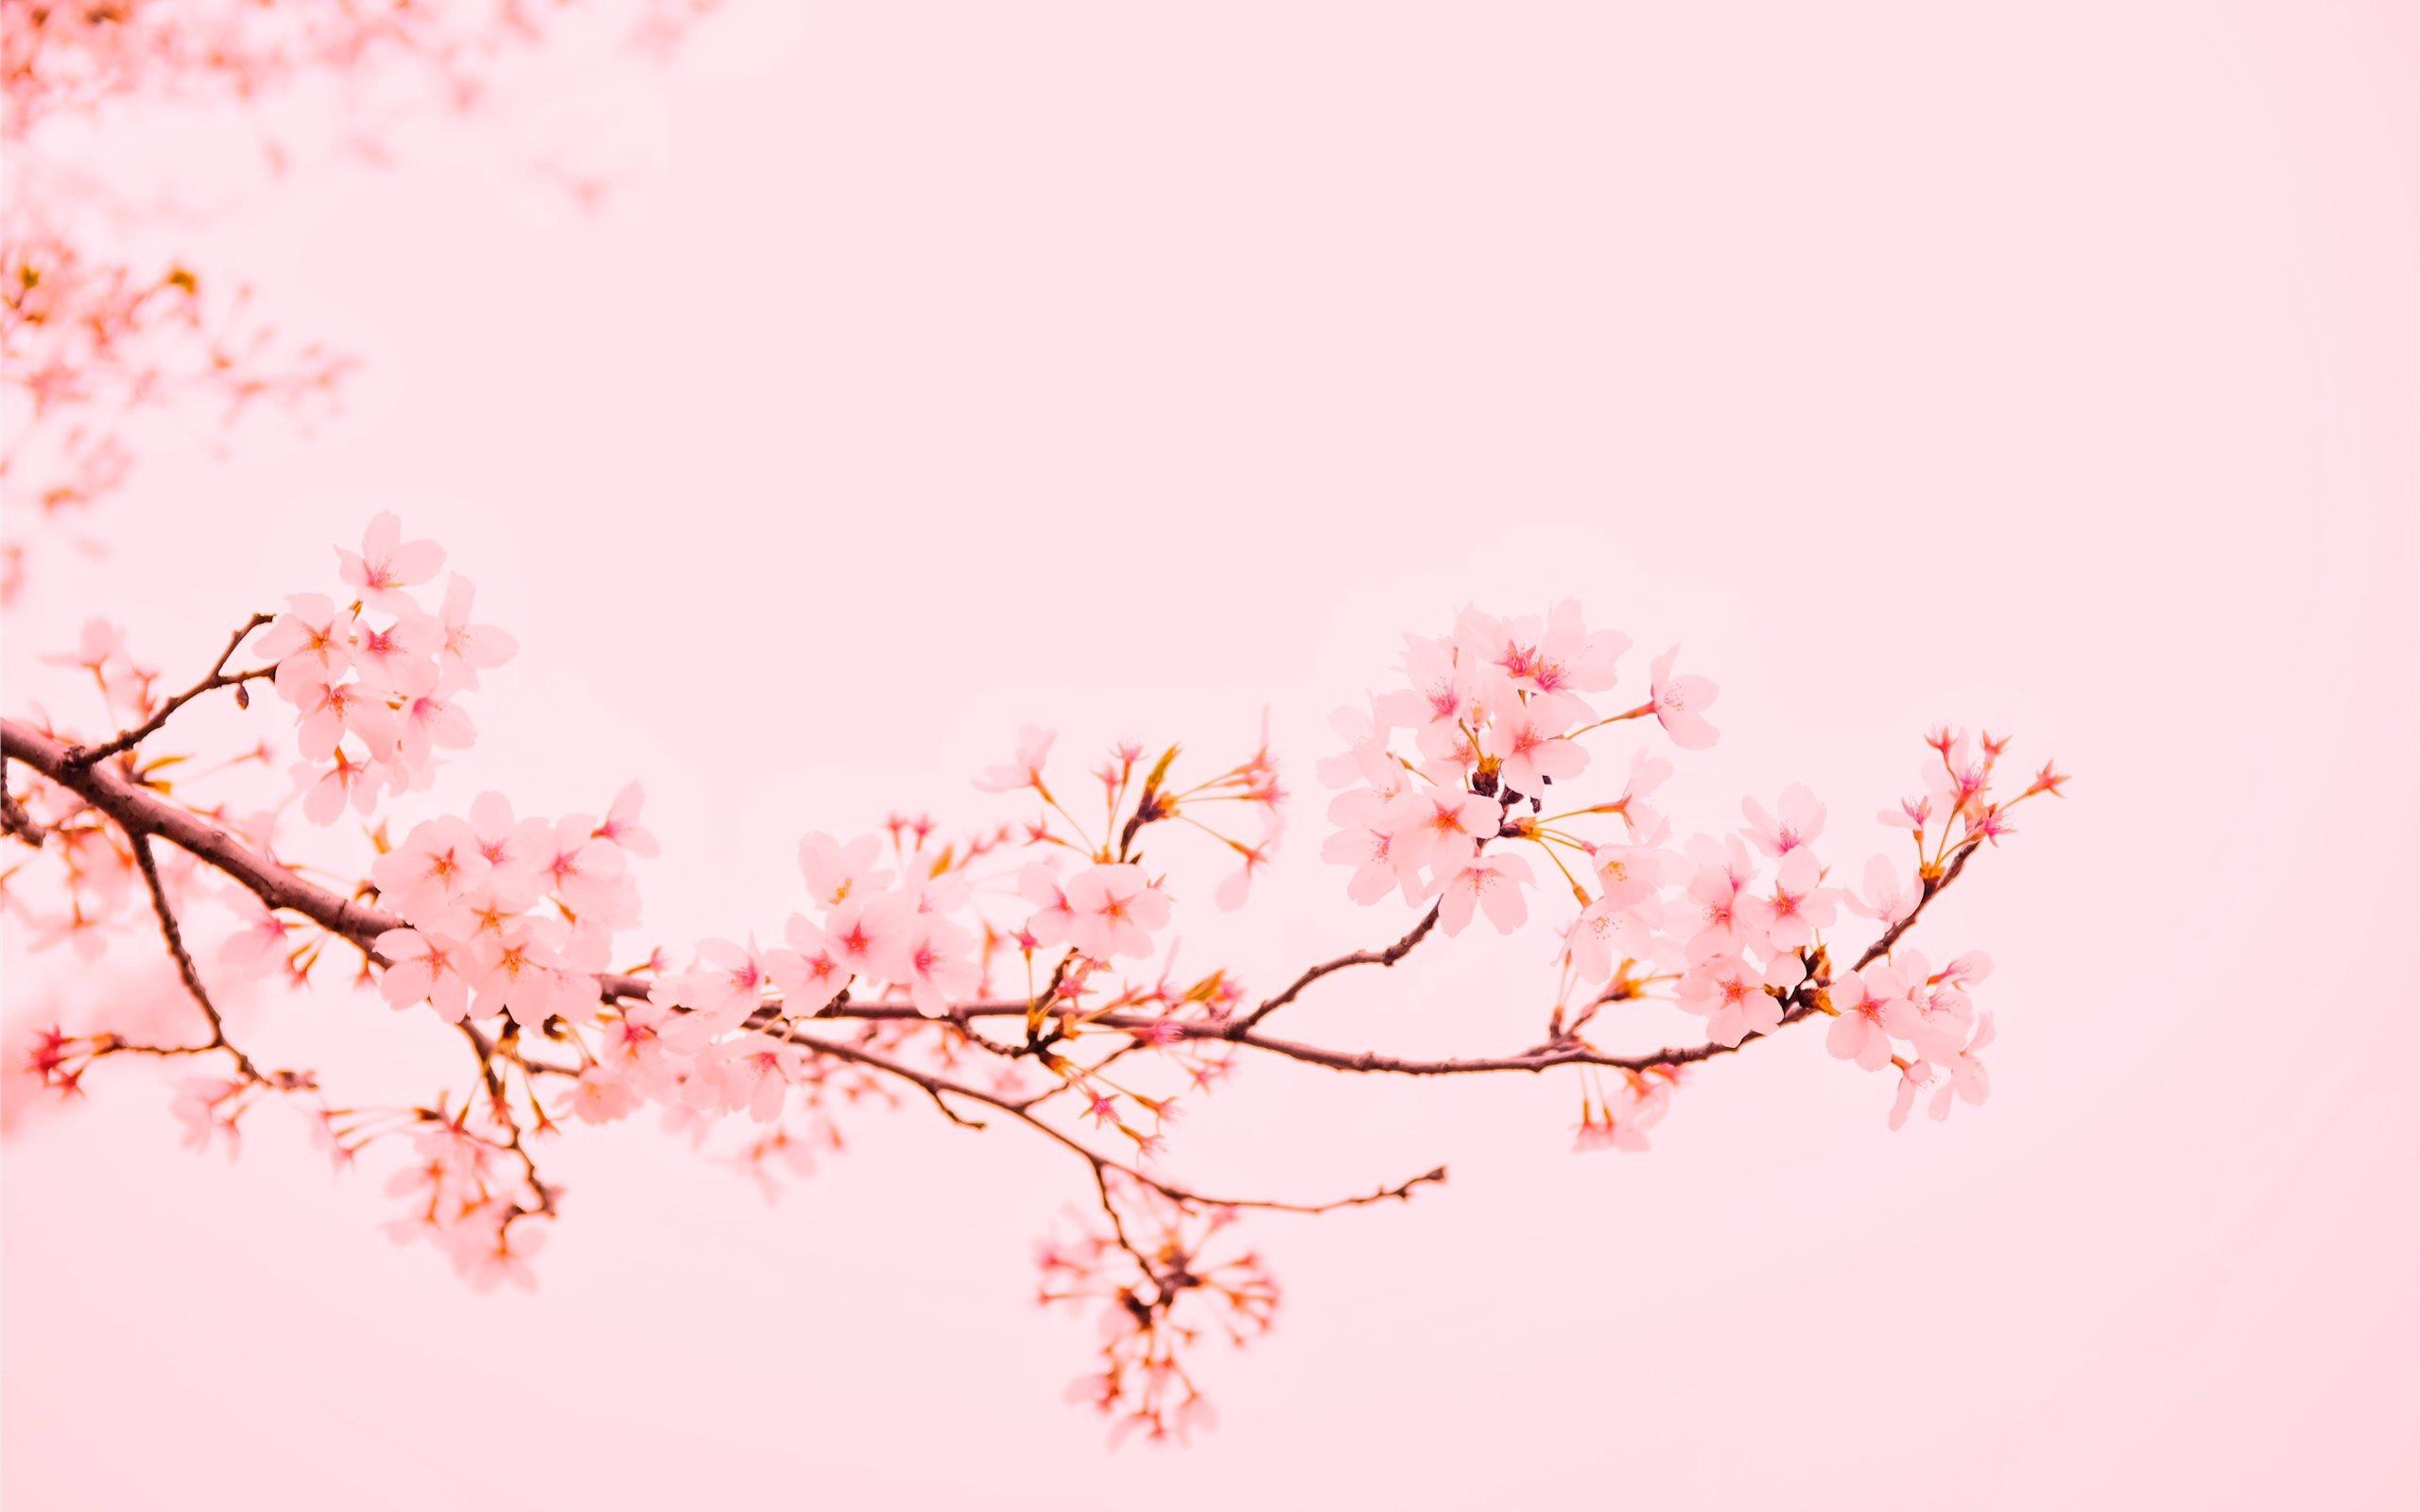 Pastel Aesthetic Cherry Blossom Wallpaper Hd Desktop   2560x1600 2560x1600